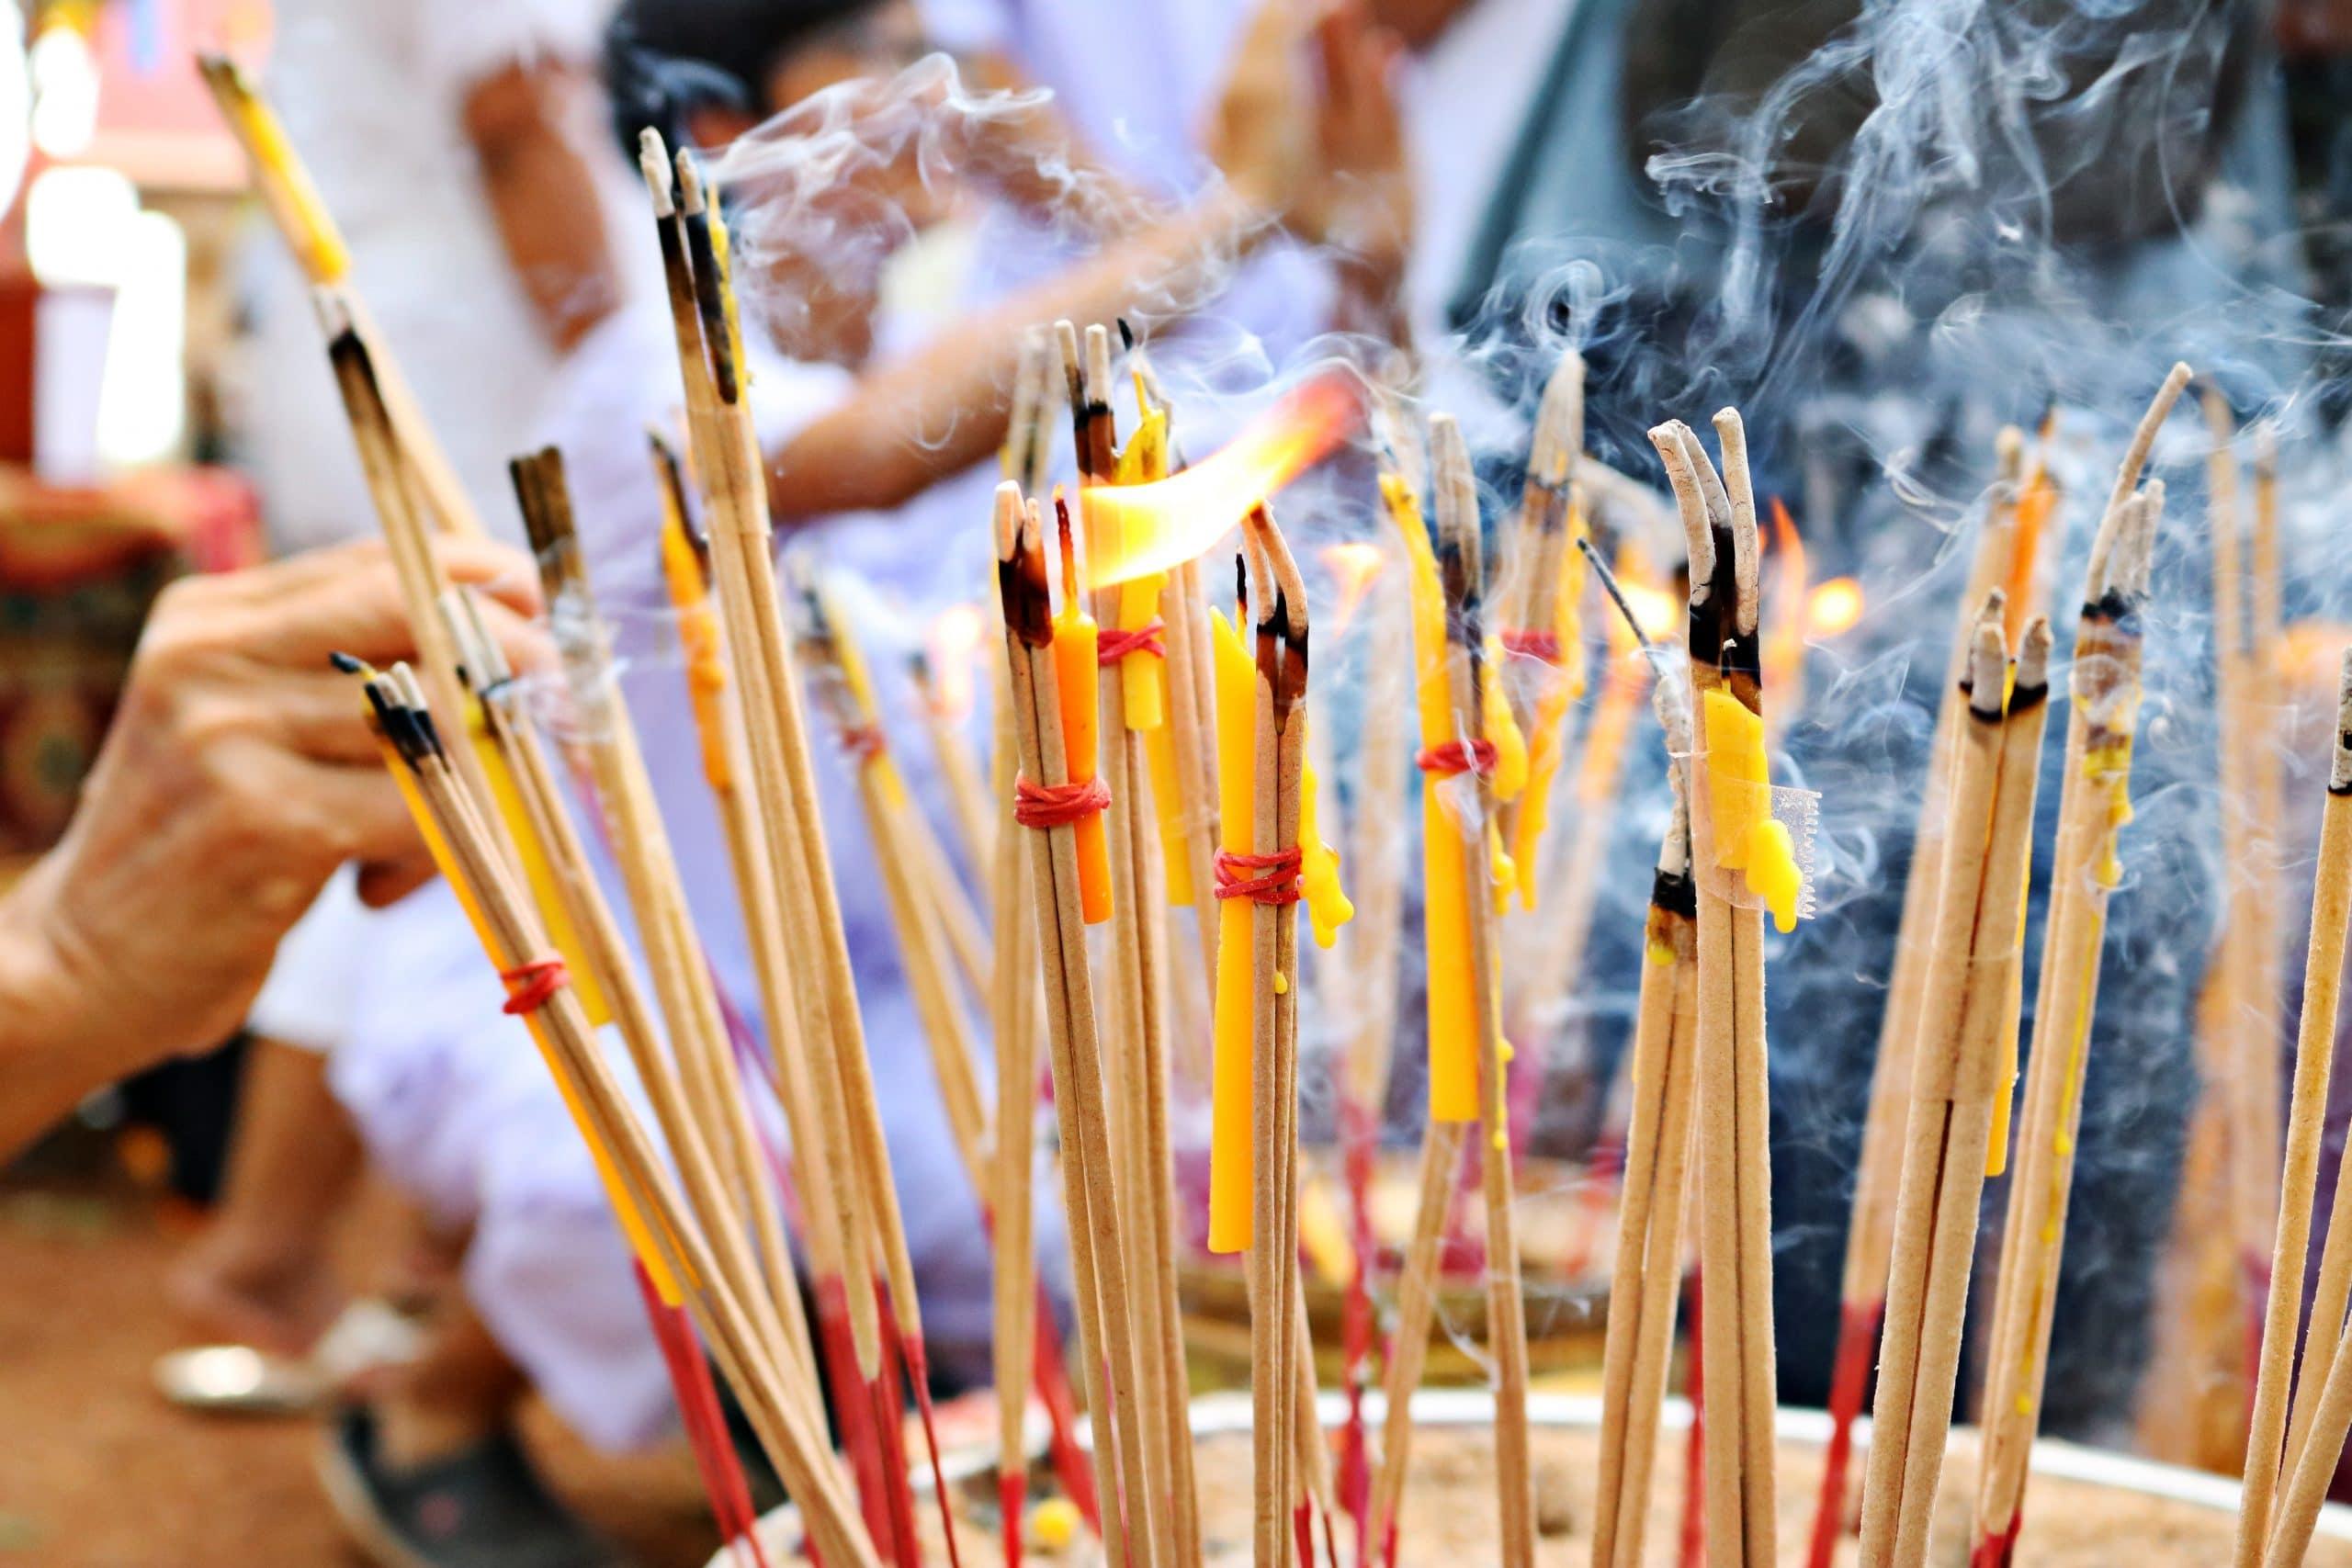 traditional incense sticks burning